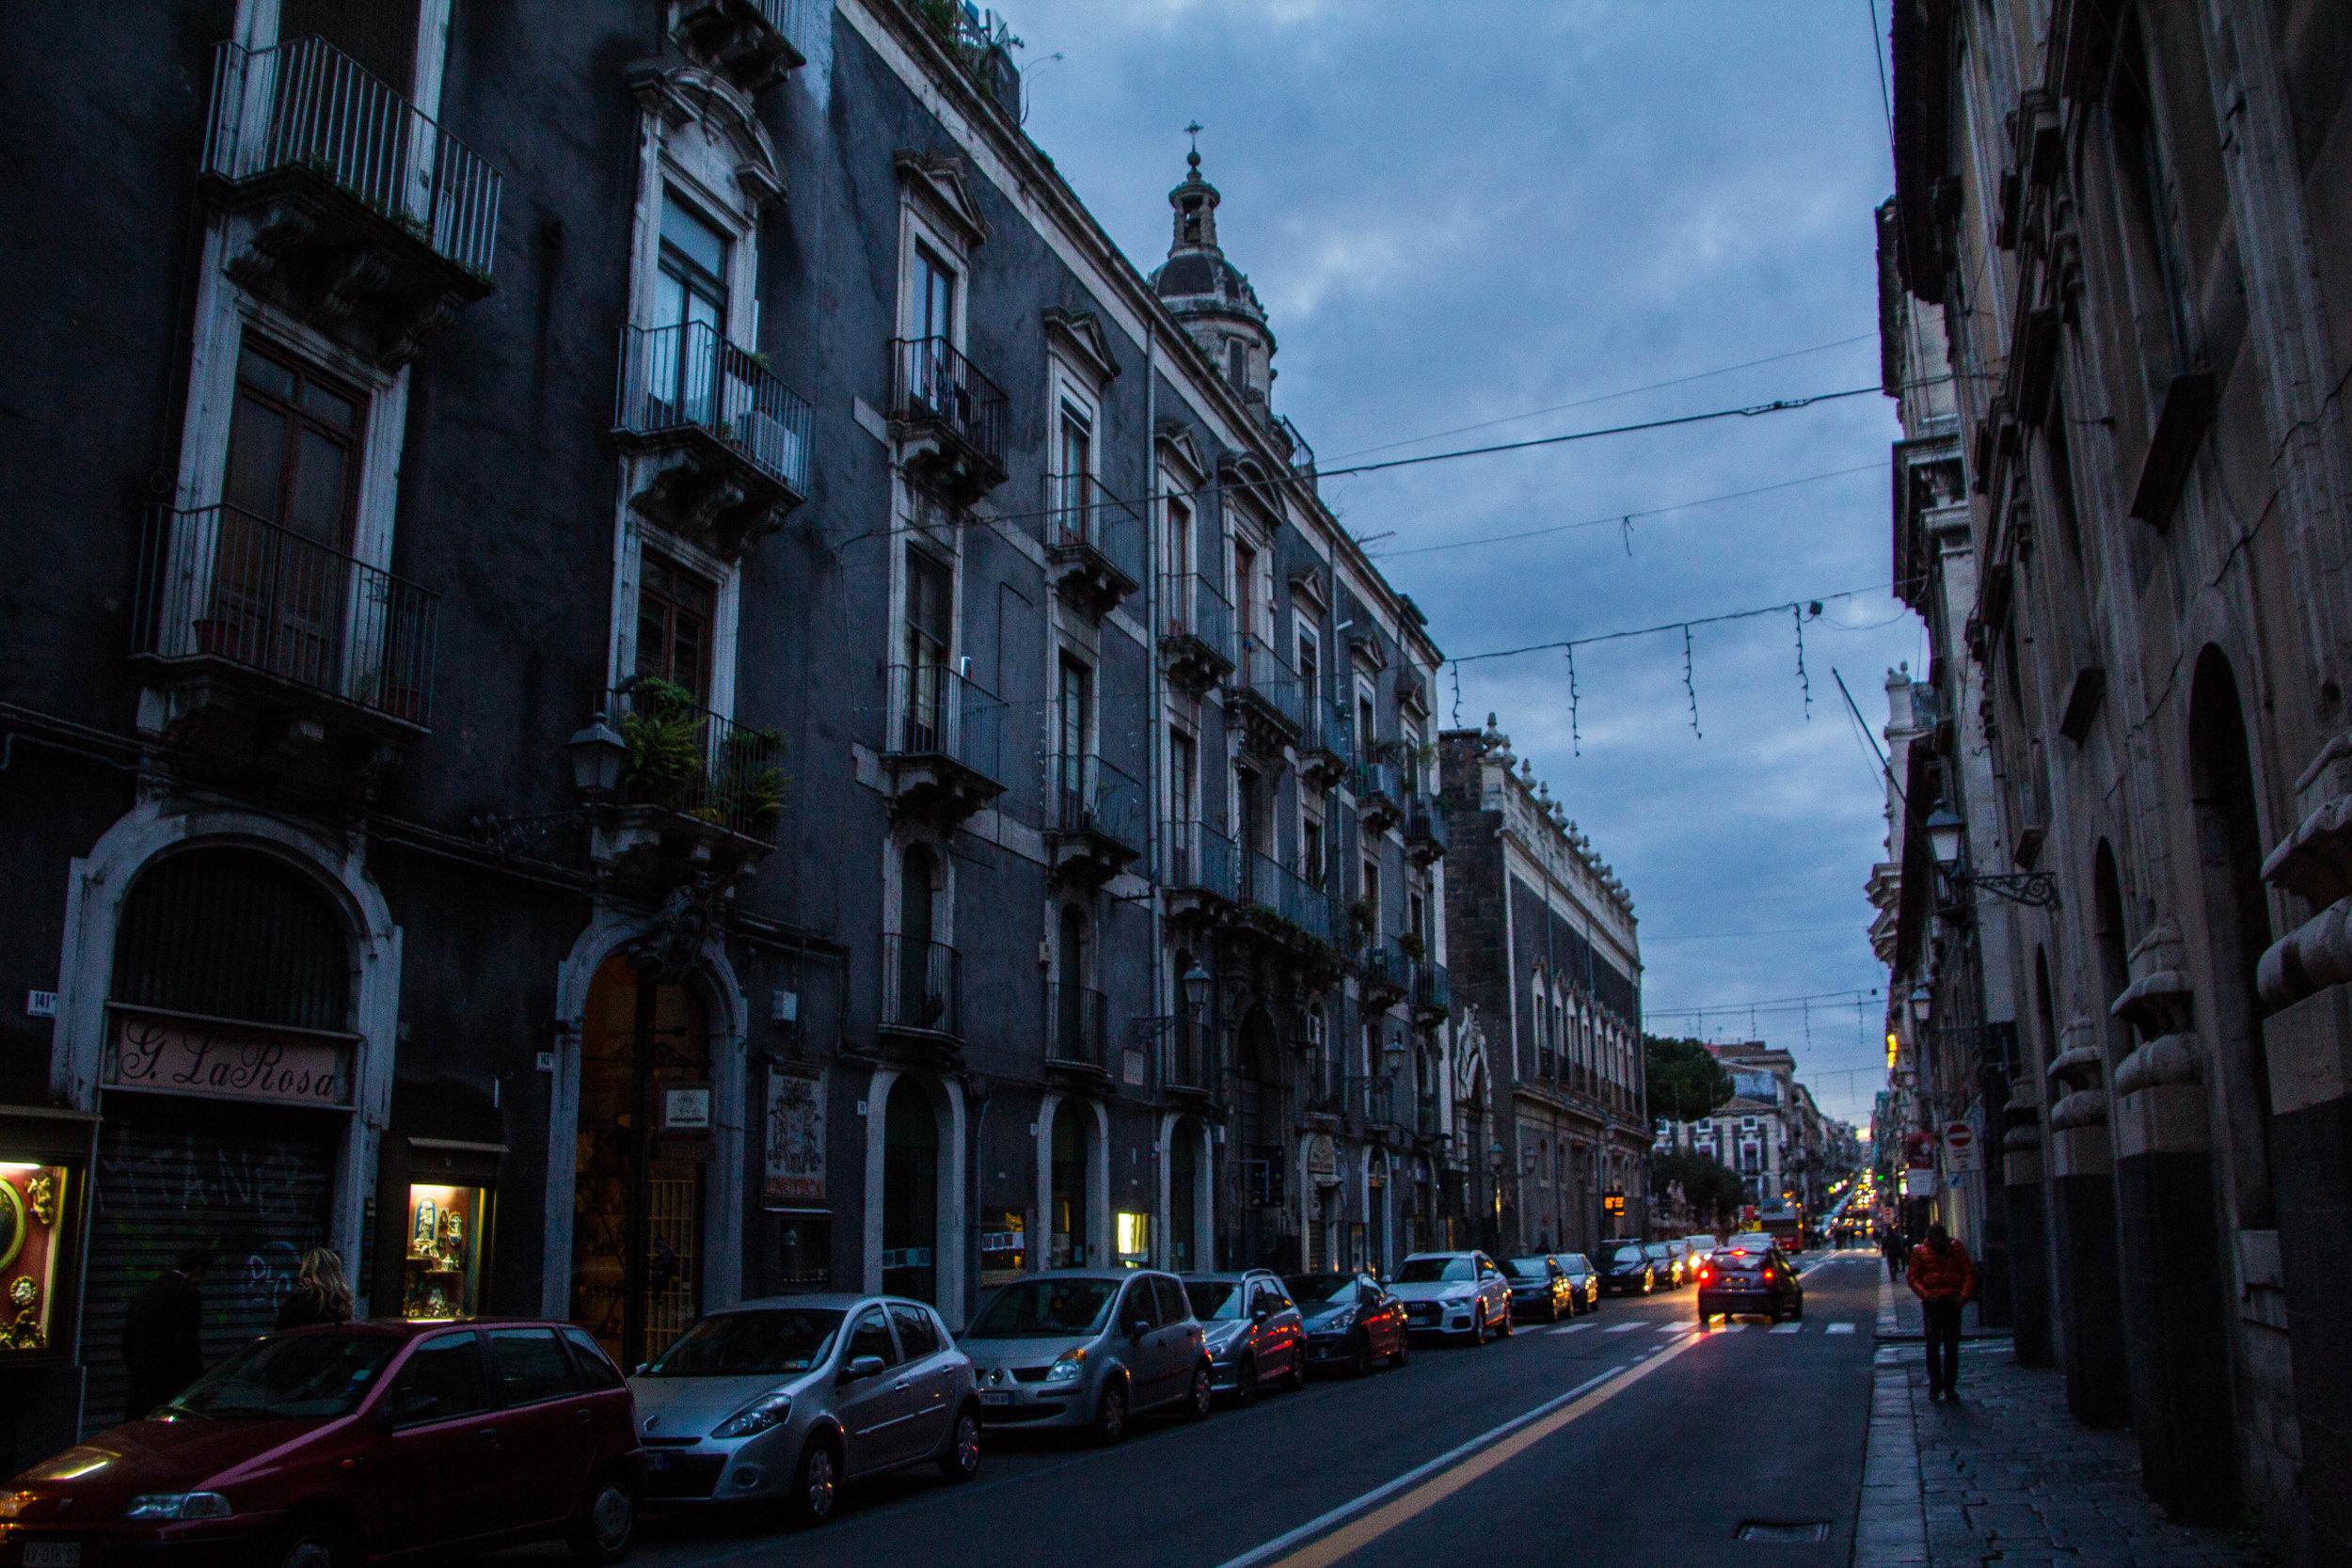 streets-catania-sicily-sicilia-42.jpg